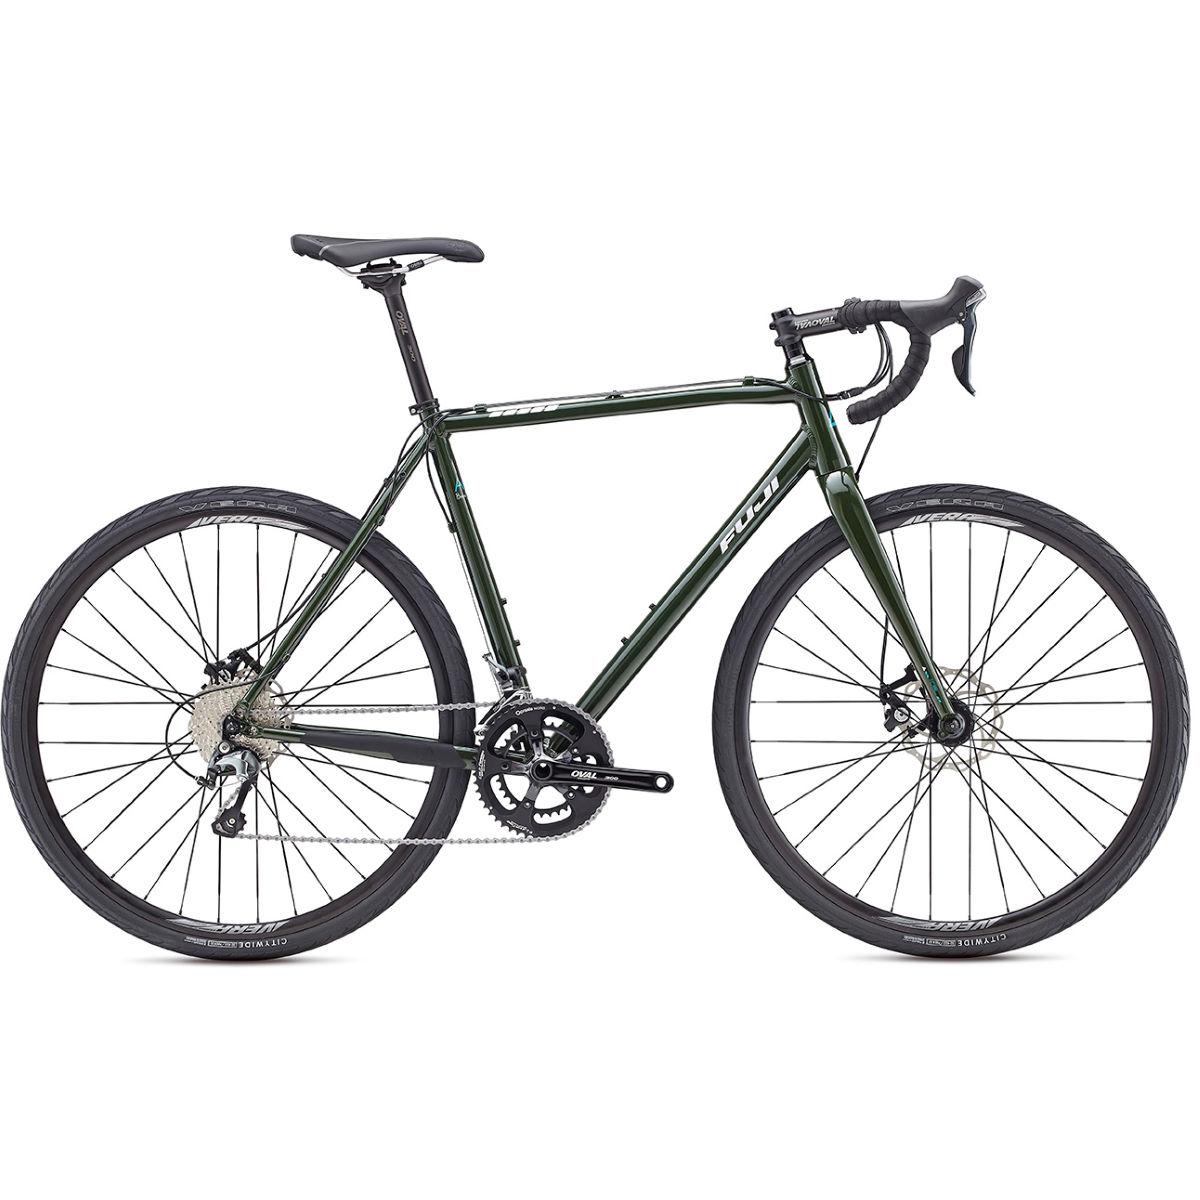 Fuji Tread 1.1 Adventure 2017 Bikes